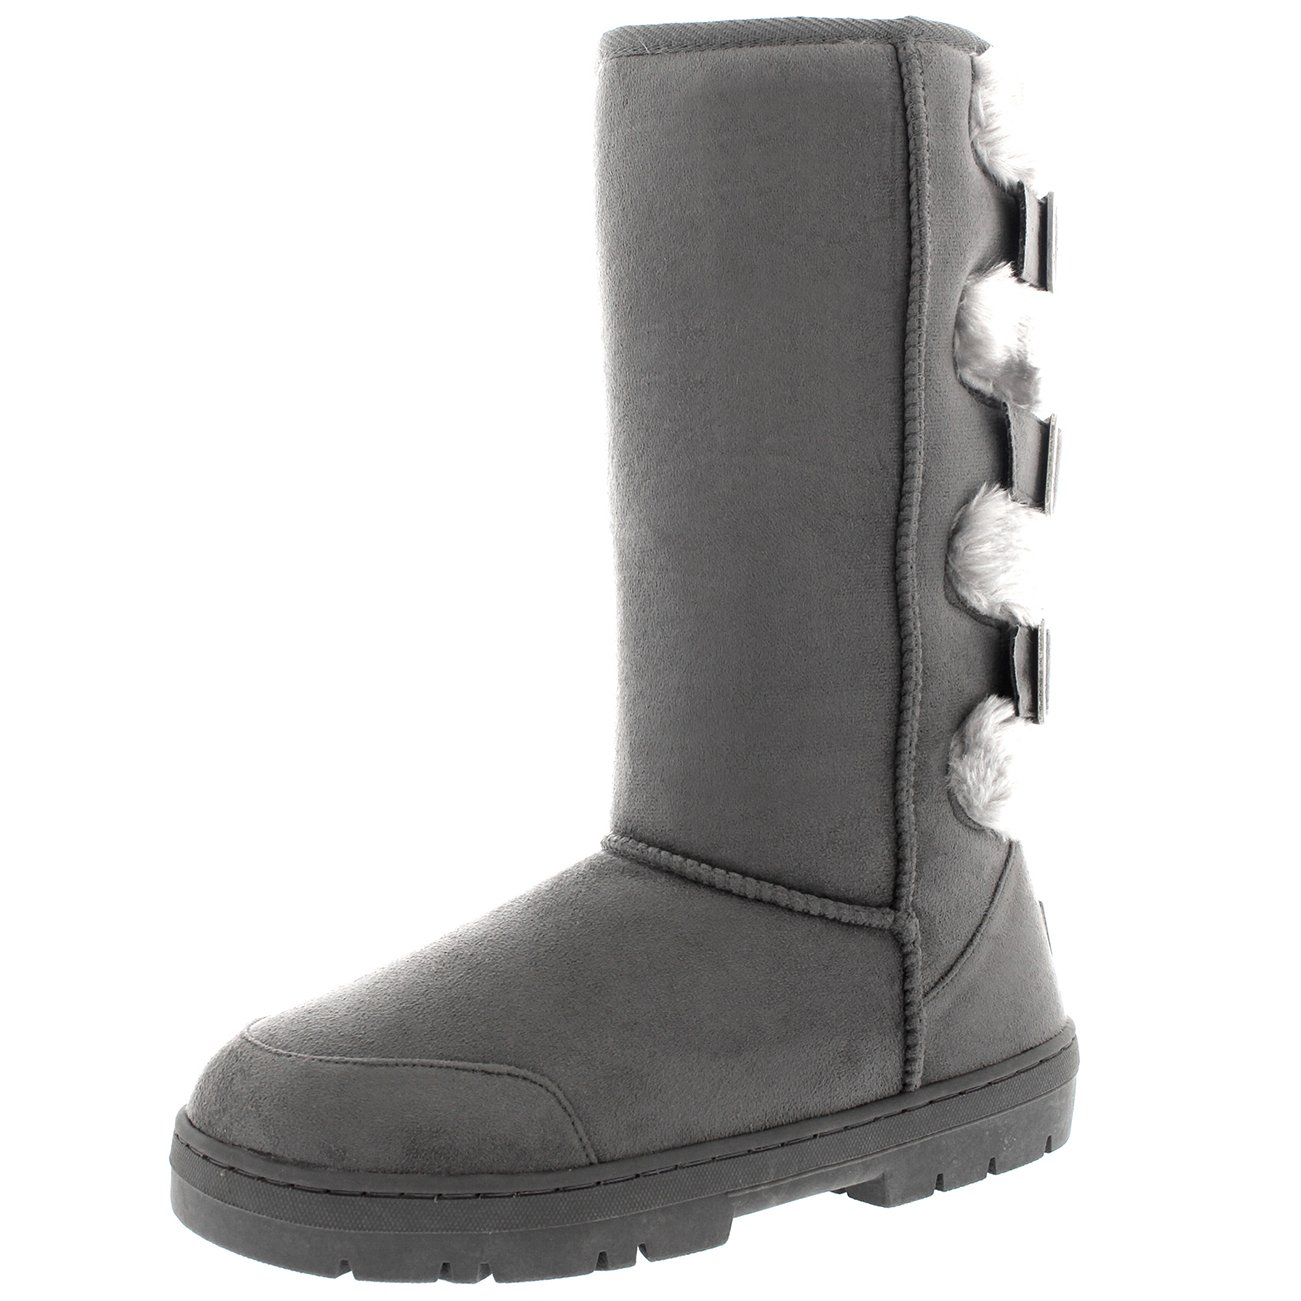 Womens Waterproof Long Winter Shoe Buckle Mid Calf Snow Boots B01FKMHOZQ 7 B(M) US|Gray/Gray Fur